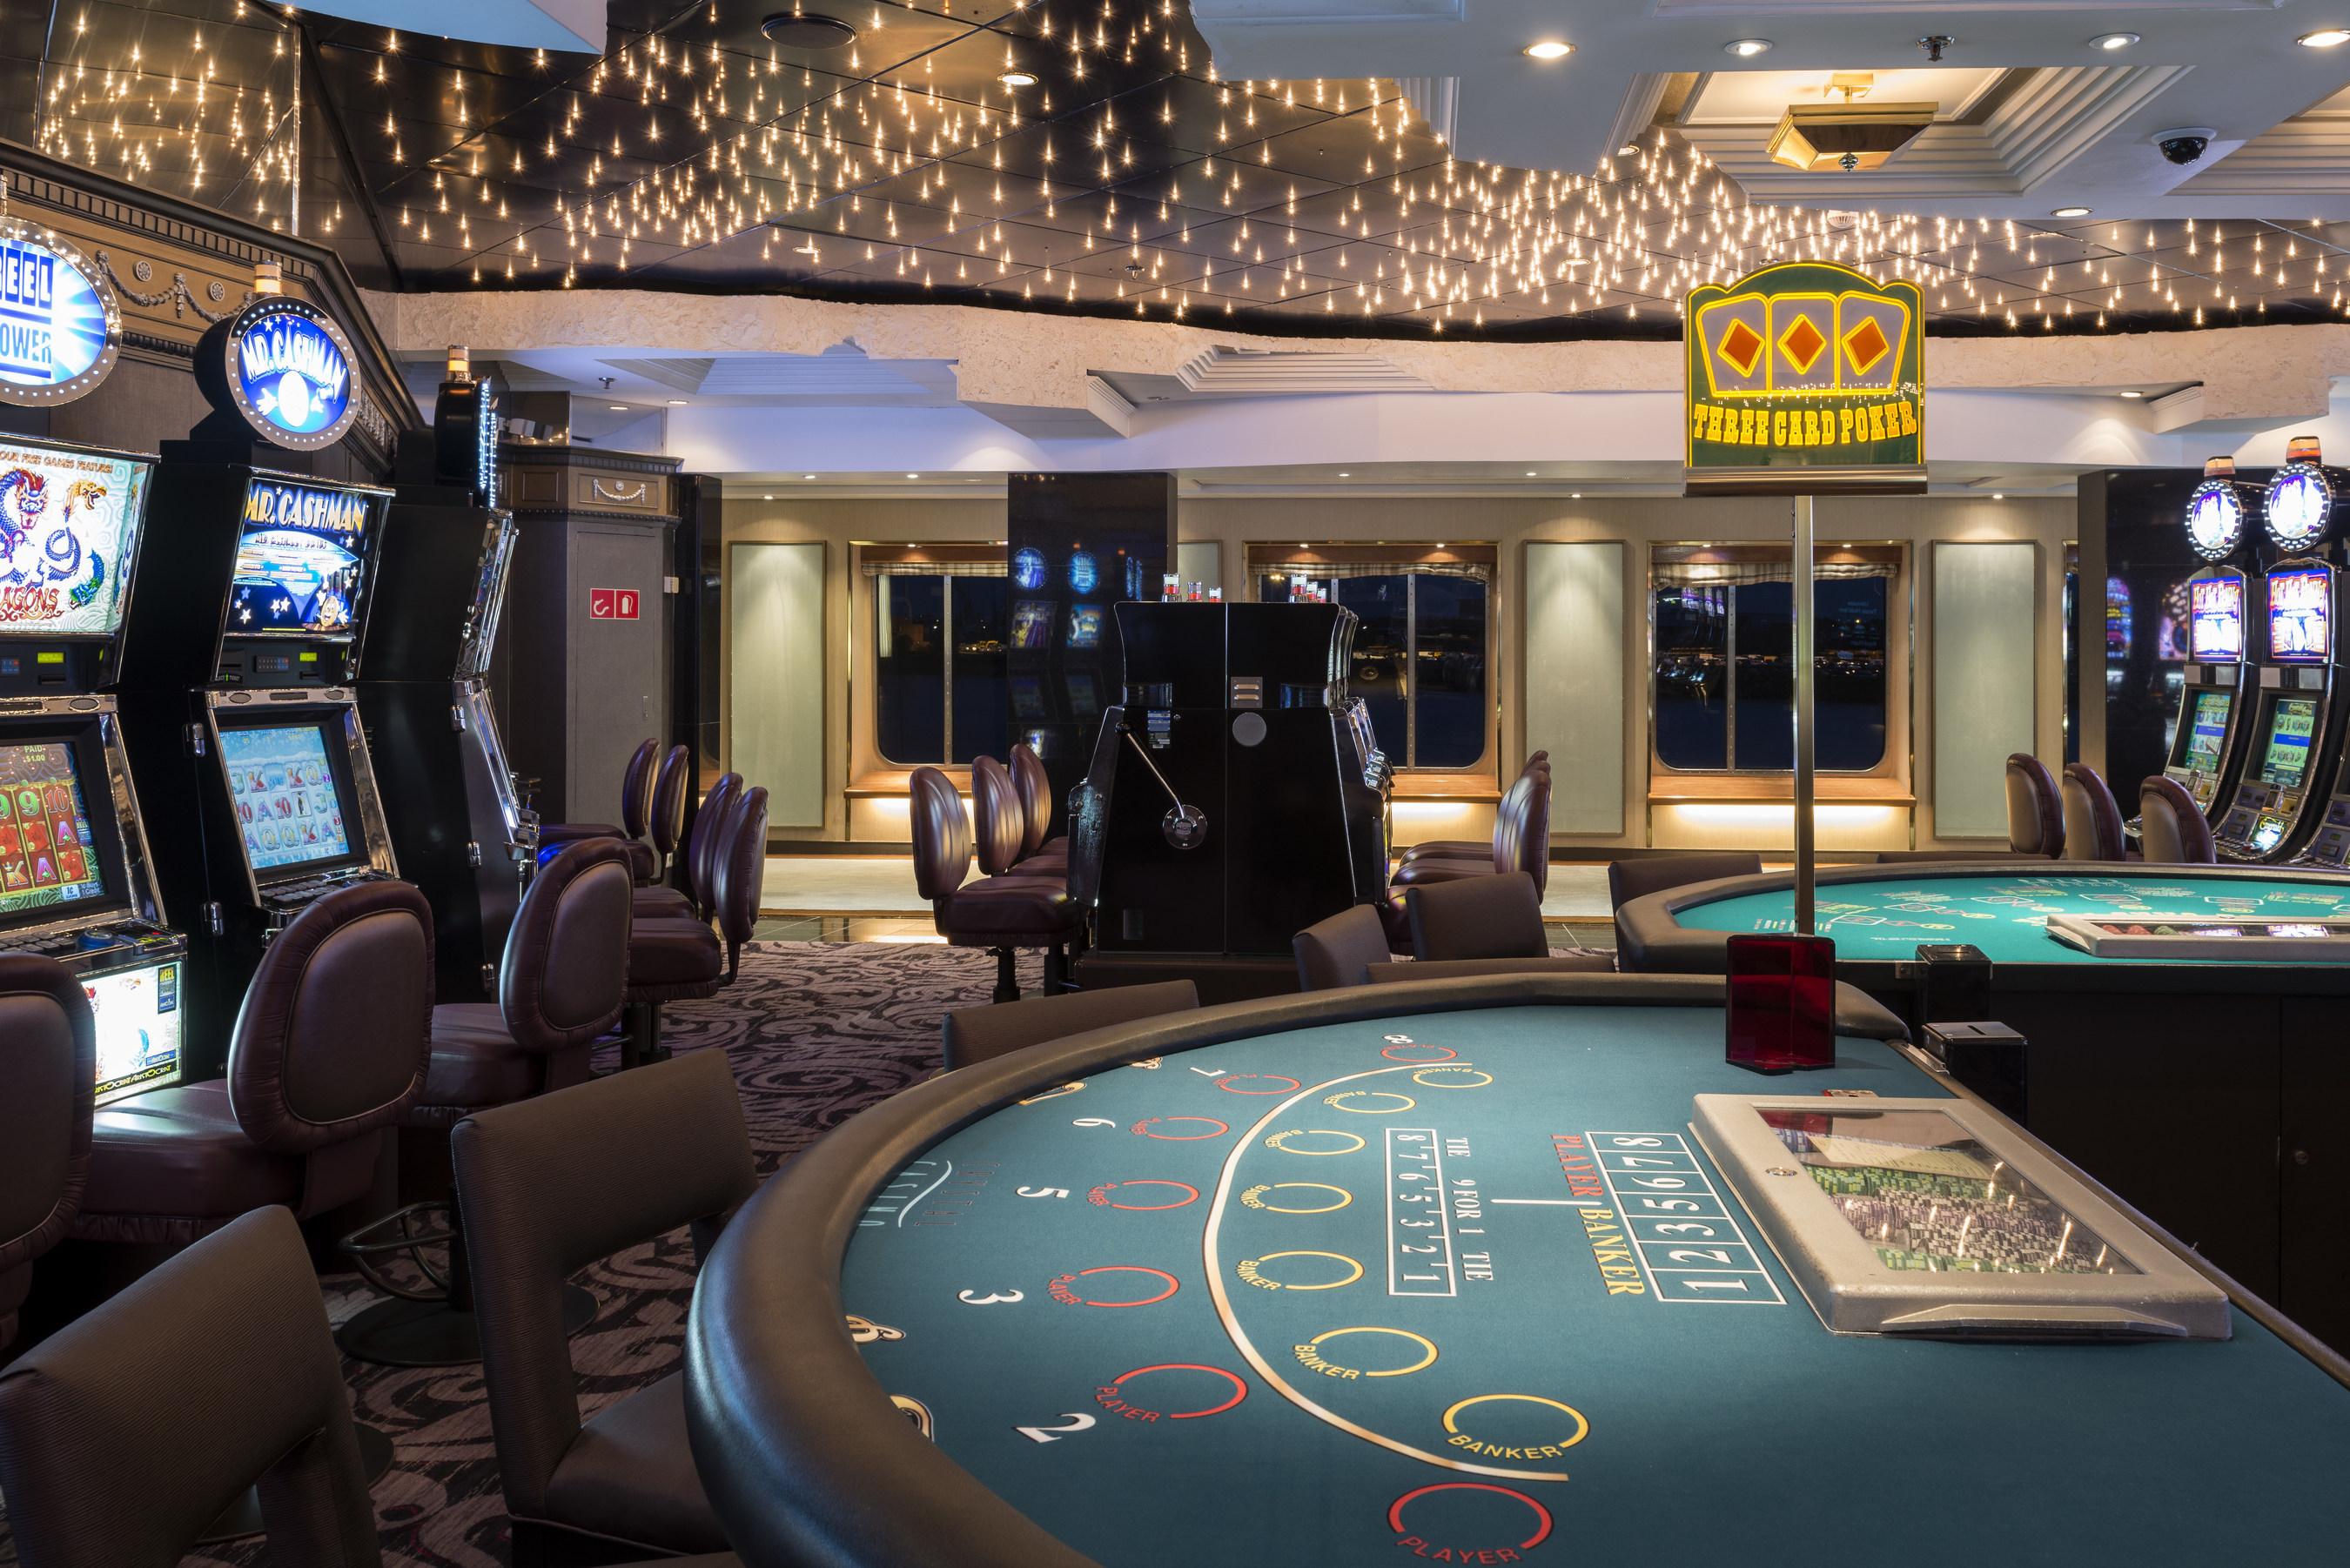 Crystal cruises casinos carte casino